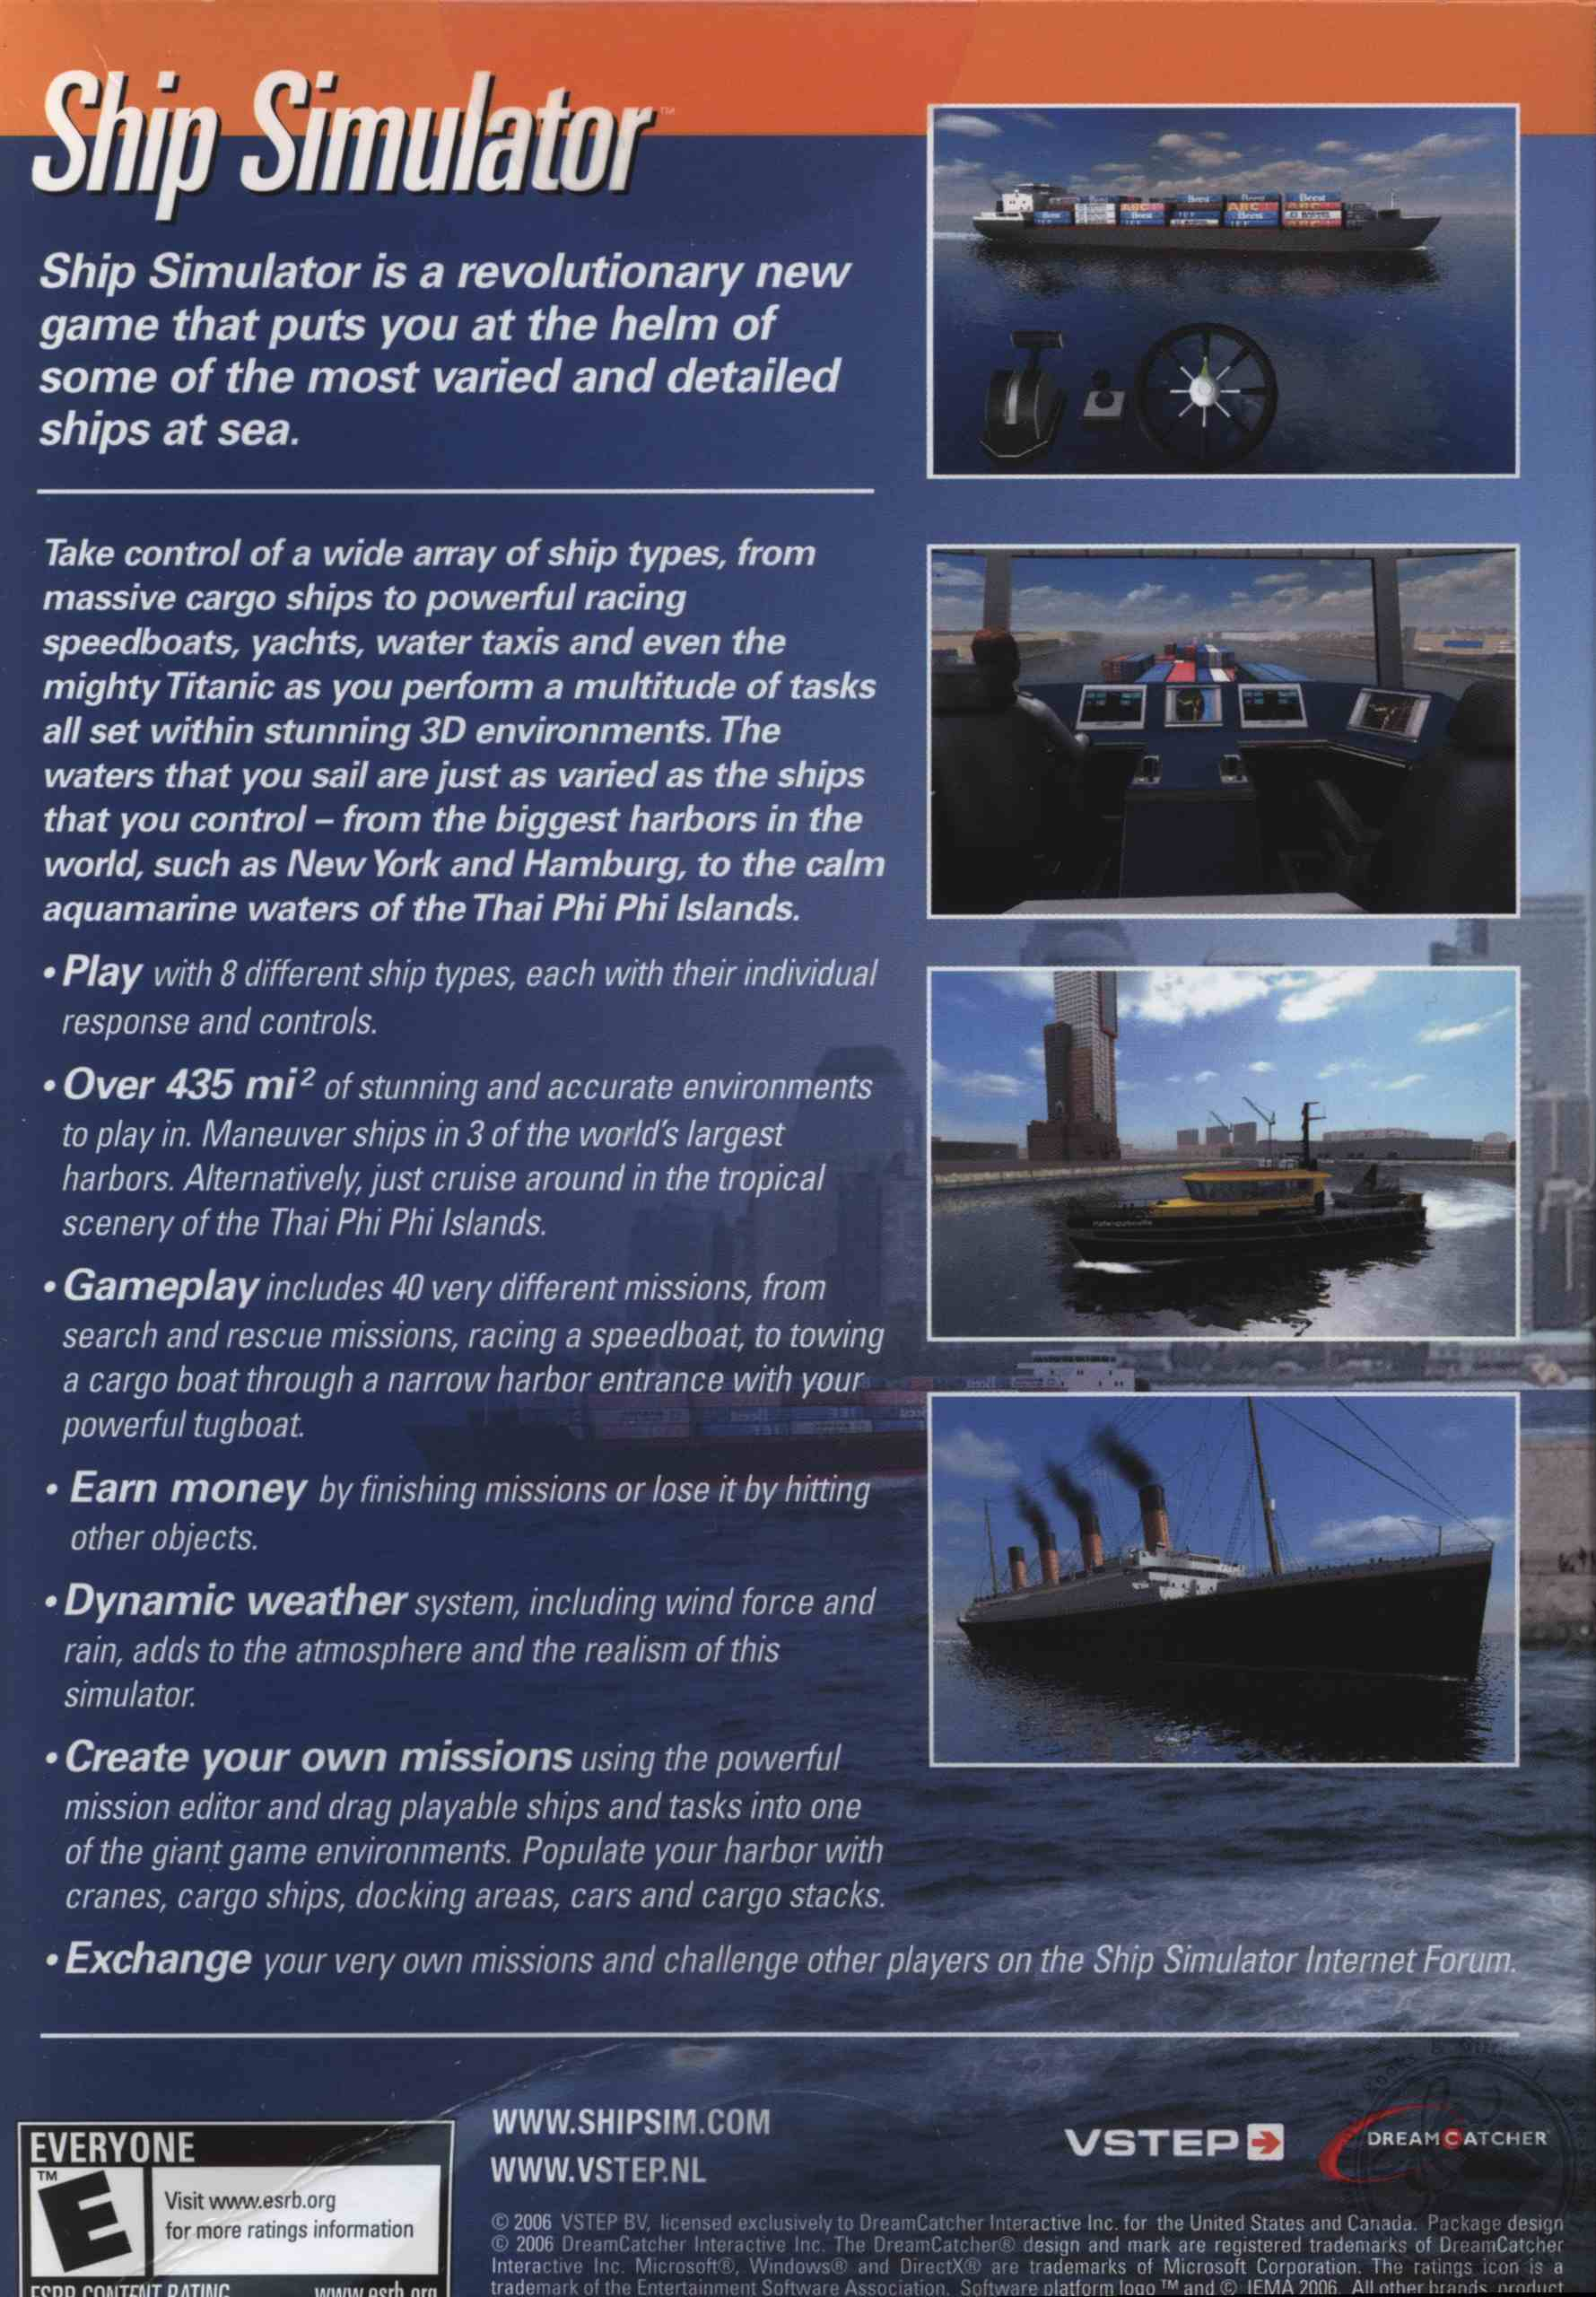 Ship Simulator (Windows 2000 / 98 / Me / XP) by Dreamcatcher